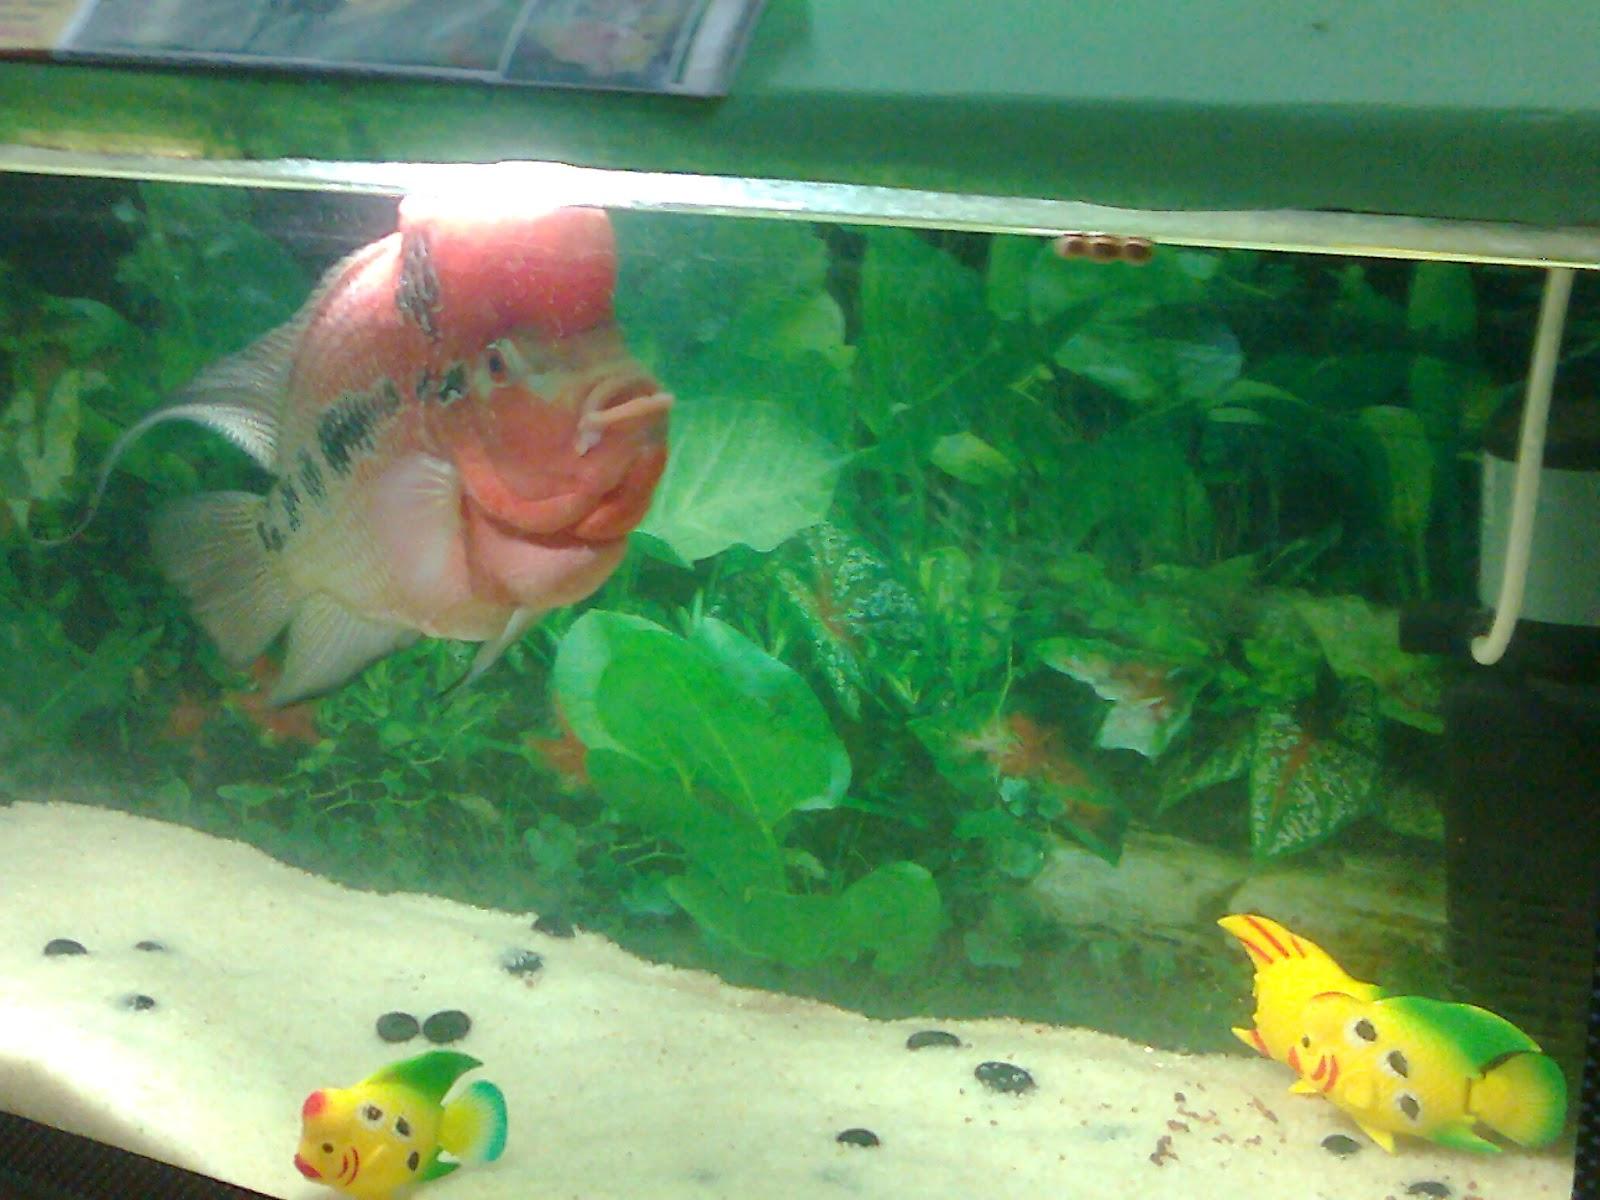 Flowerhorn fish Aquarium in Ahmedabad Exhibition. Fish Prize is 15,000 ...